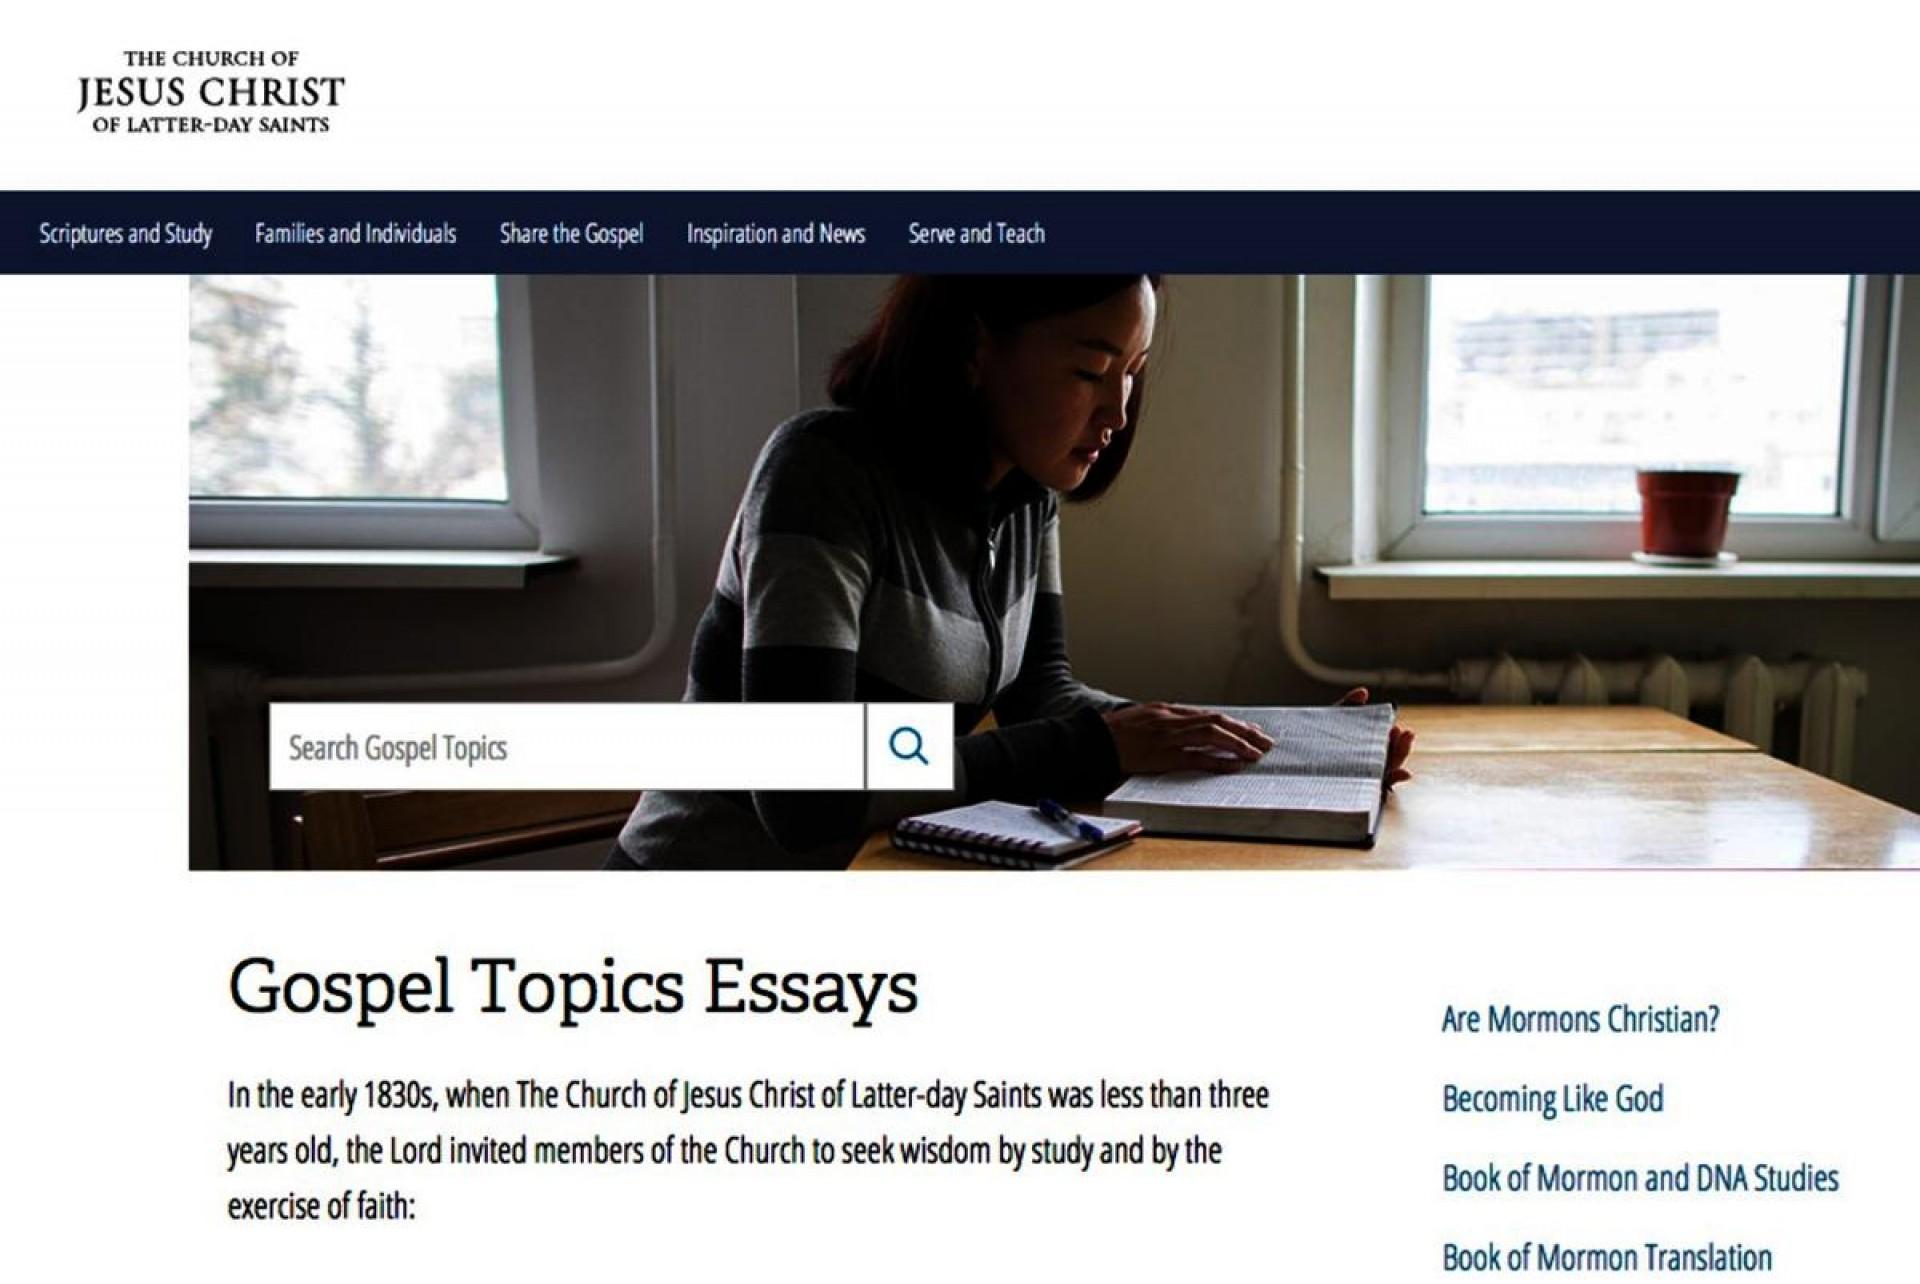 001 Essay Example Gospel Topics Essays Outstanding Book Of Abraham Pdf Mormon Translation 1920